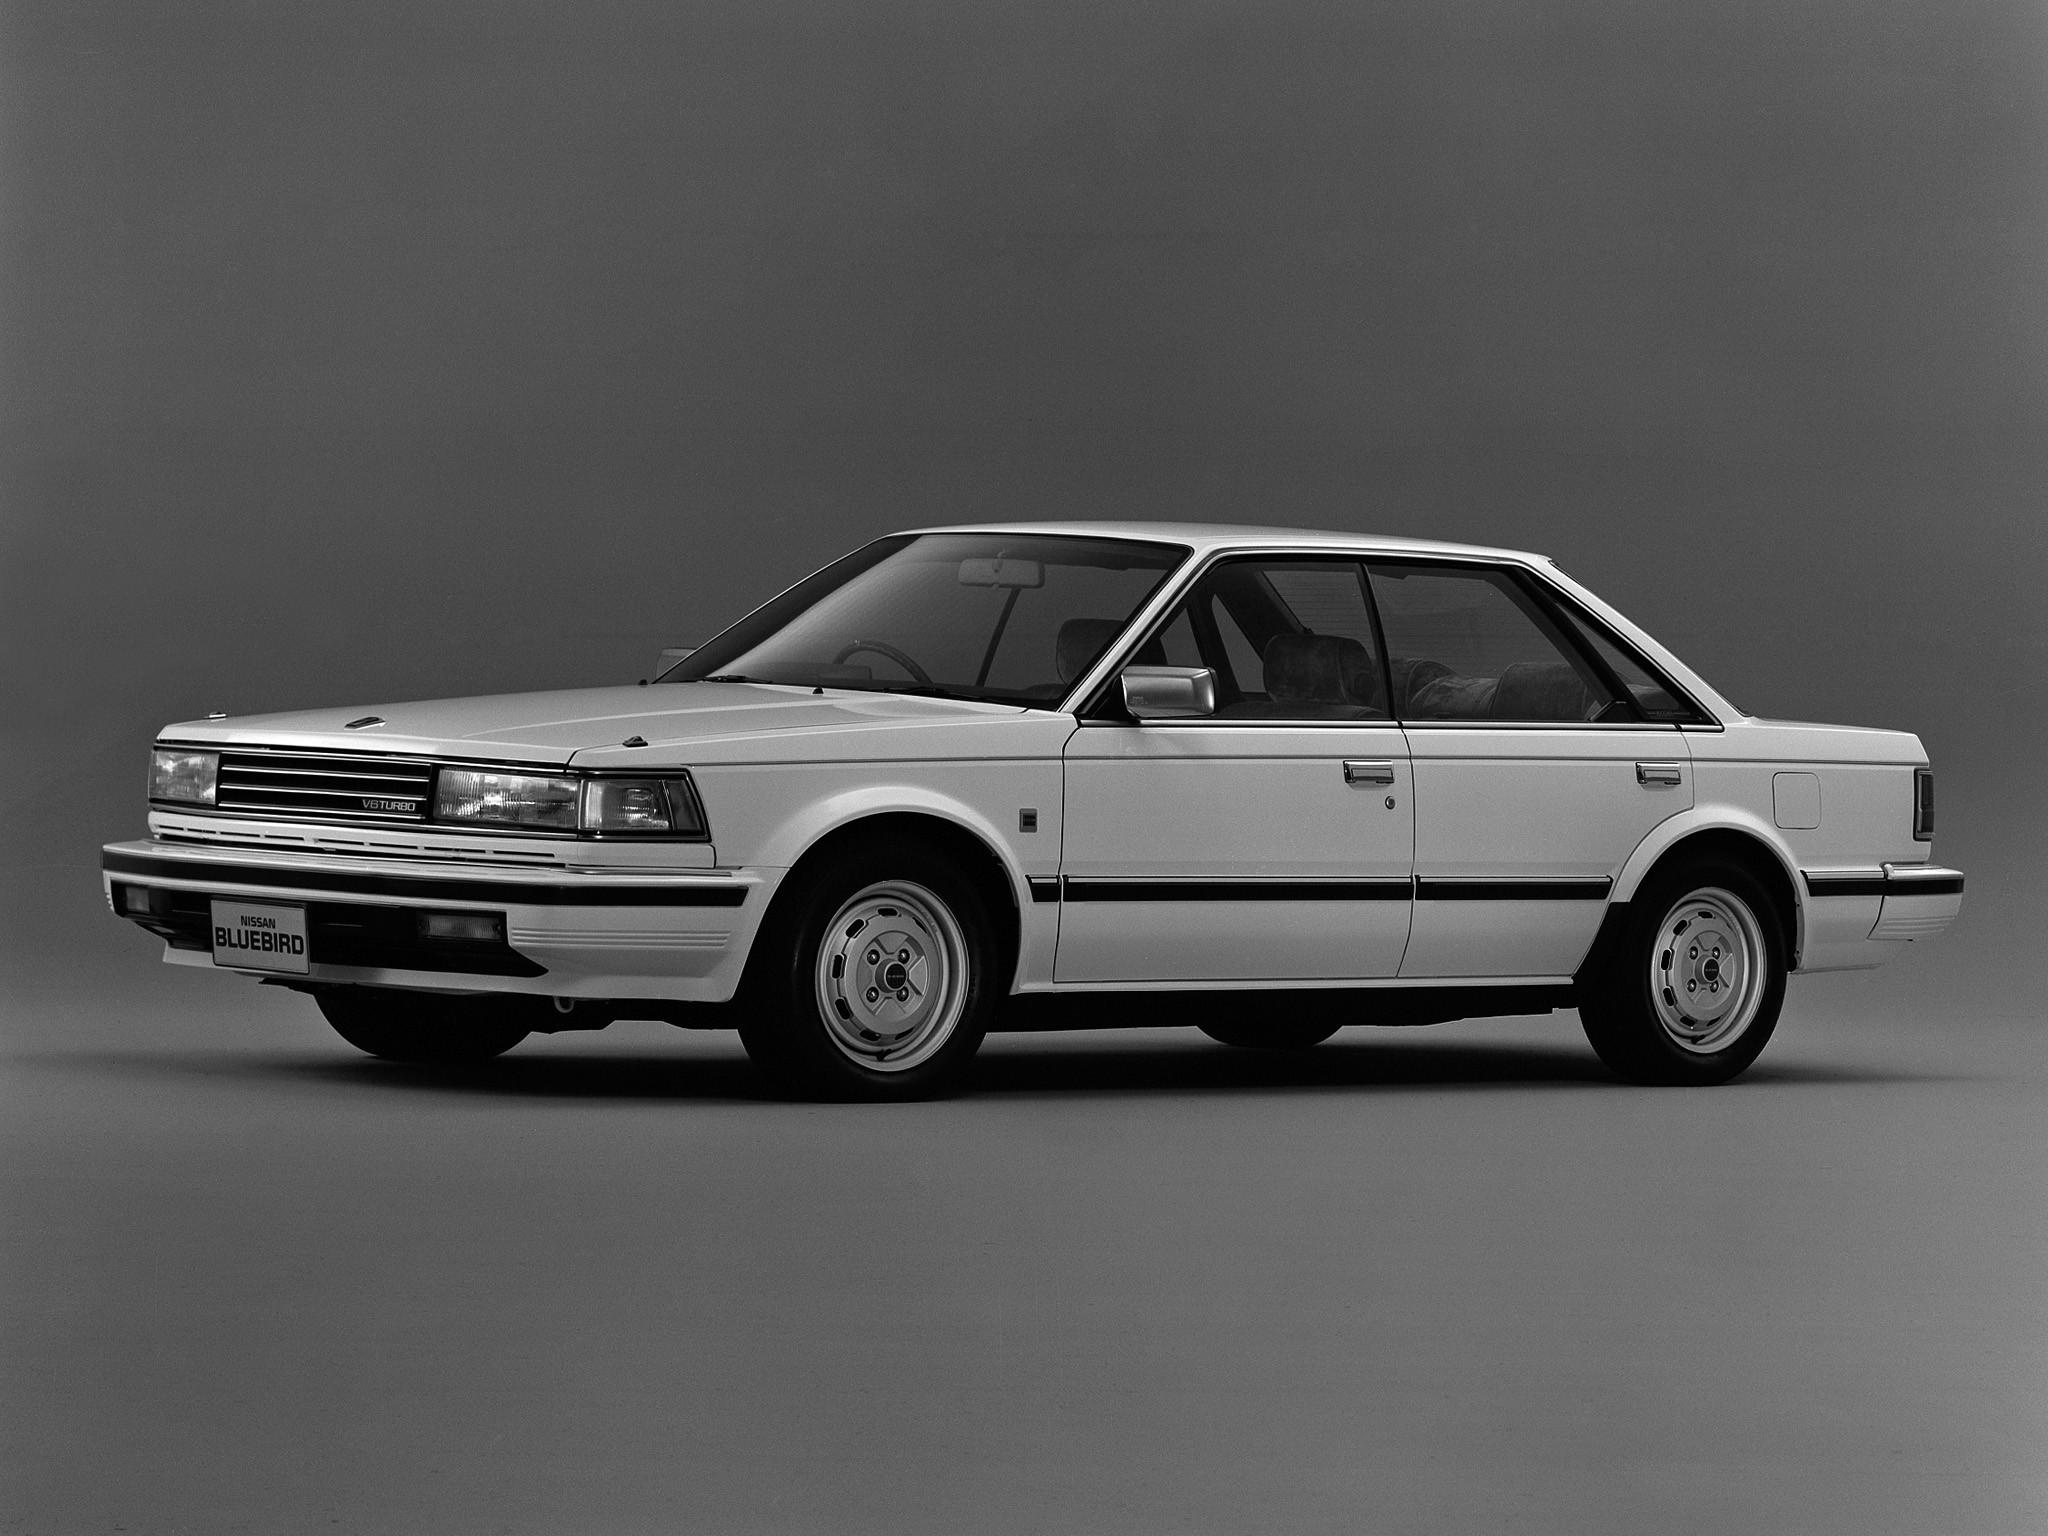 ... NISSAN Bluebird Sedan (1986 - 1990) ...